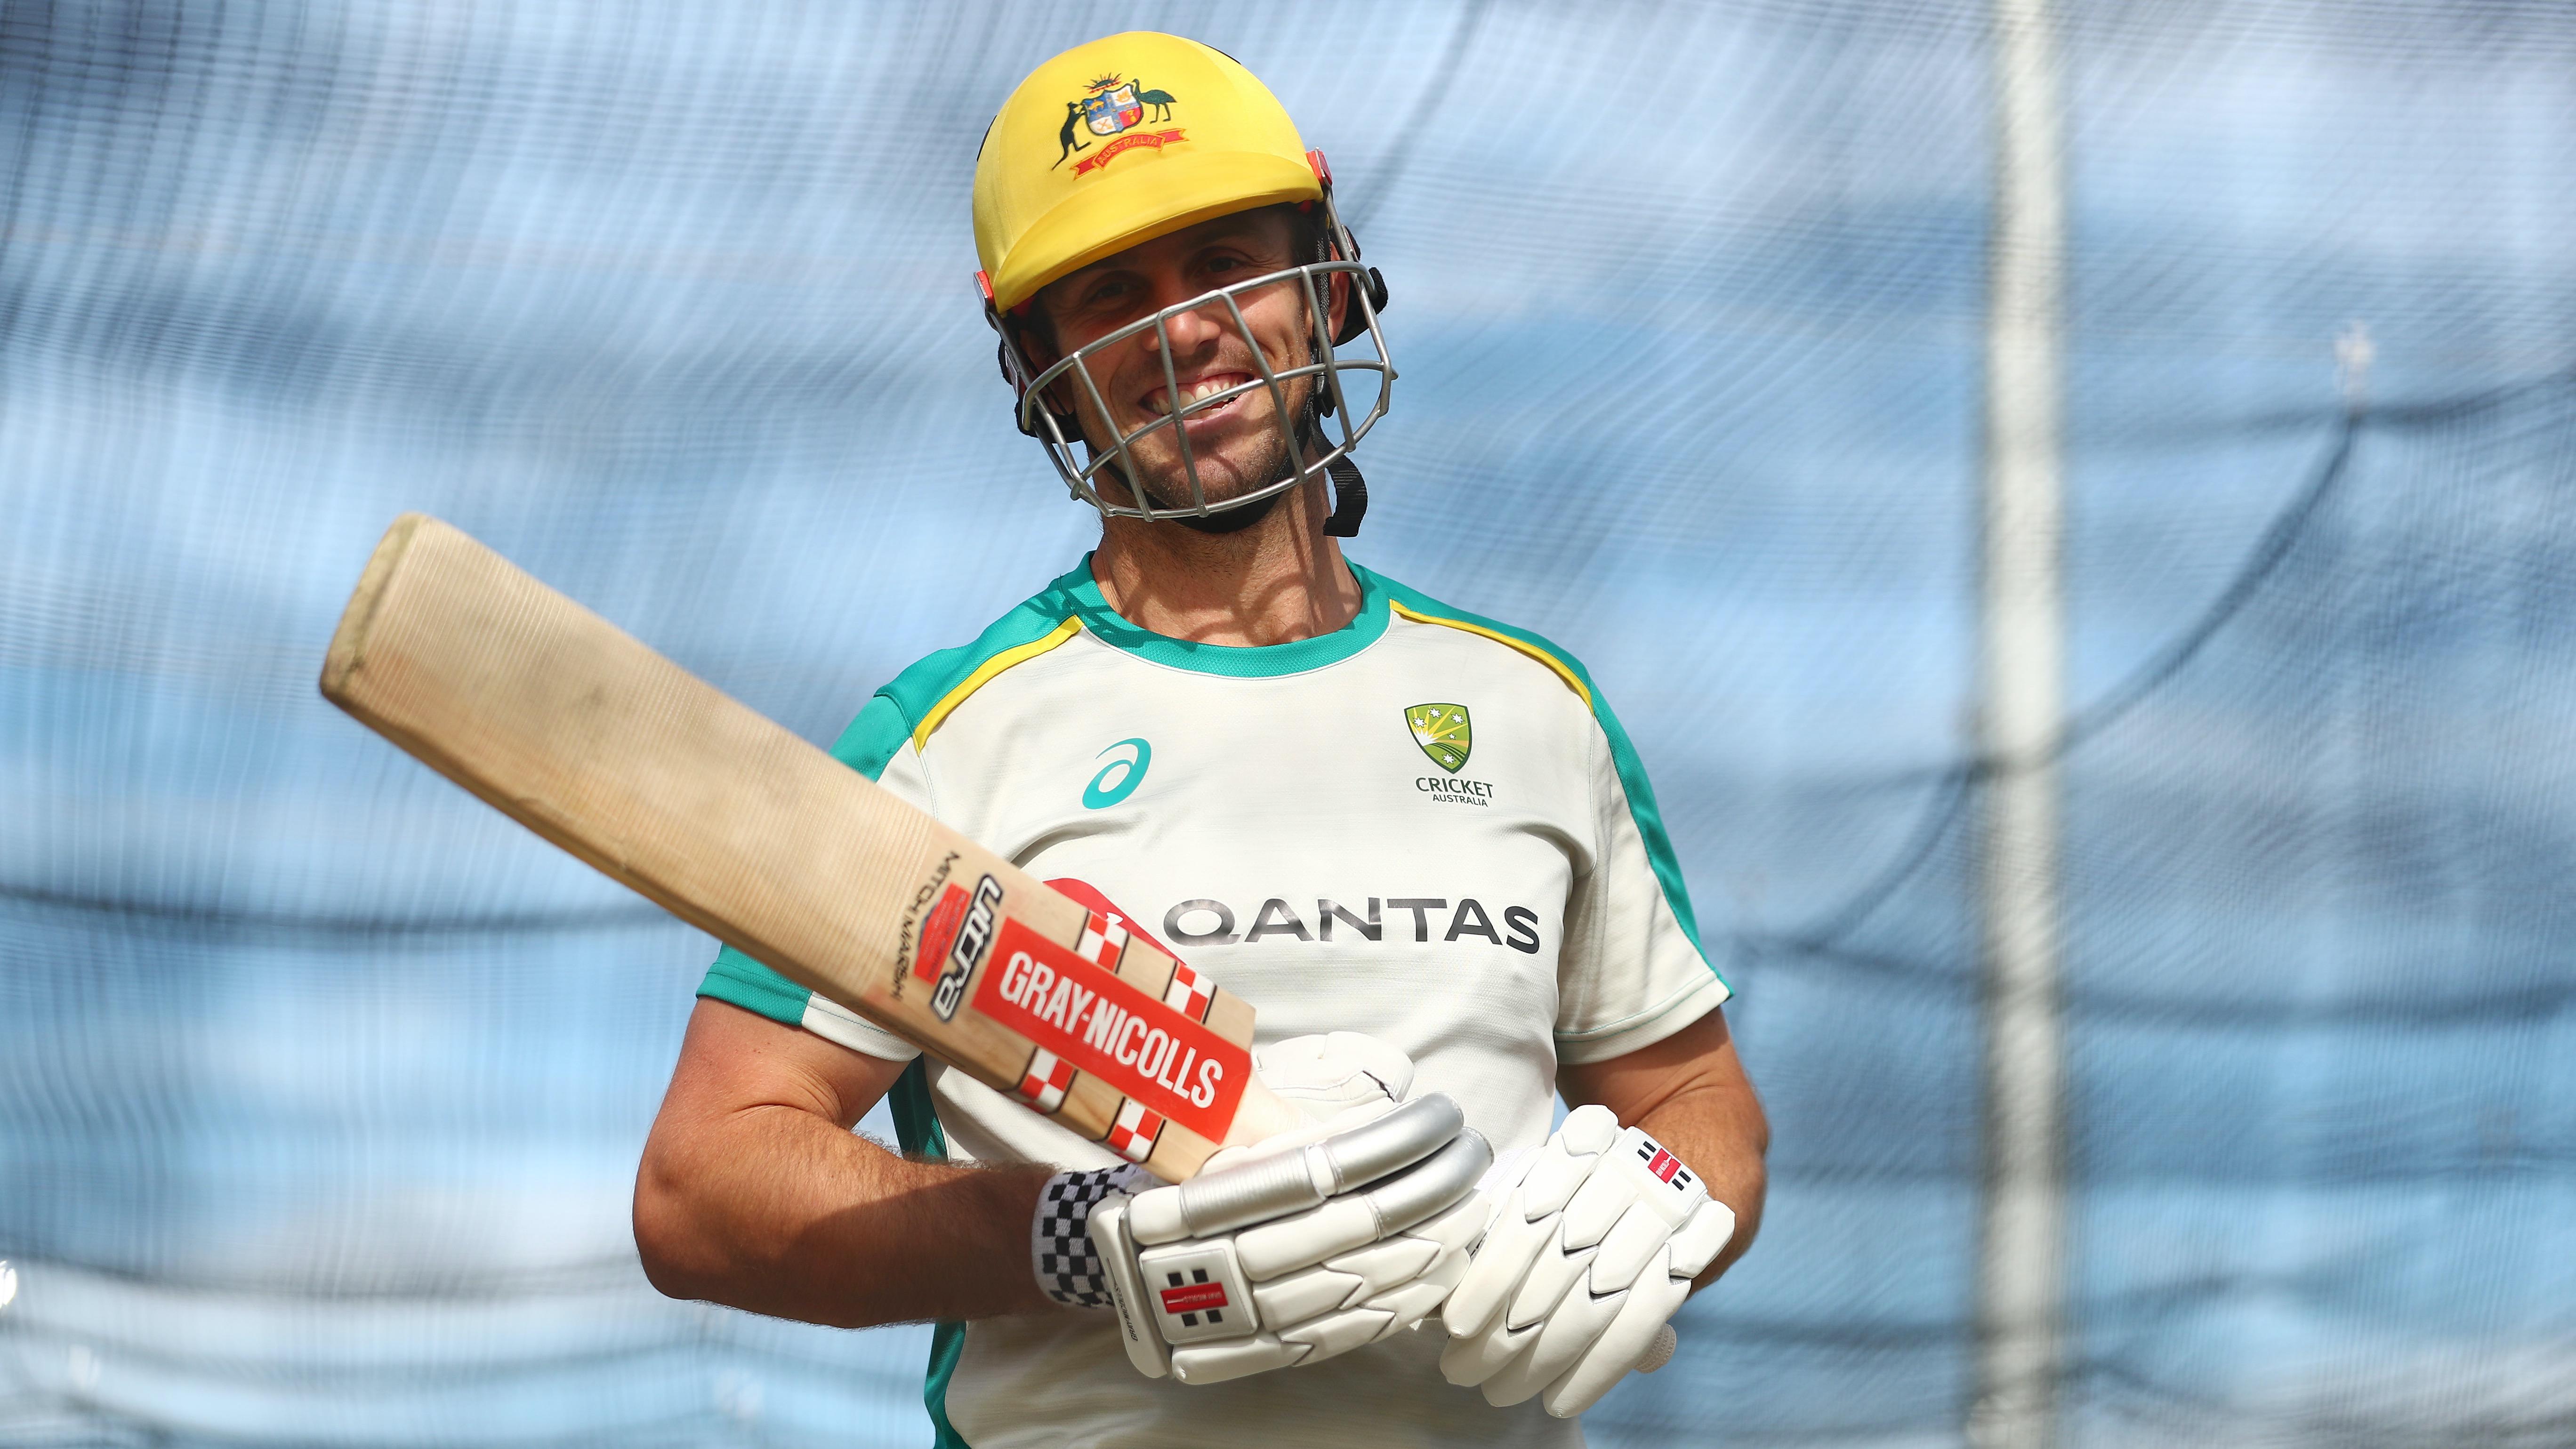 West Indies Vs Australia Live Stream How To Watch Odi Cricket Online In Australia Techradar